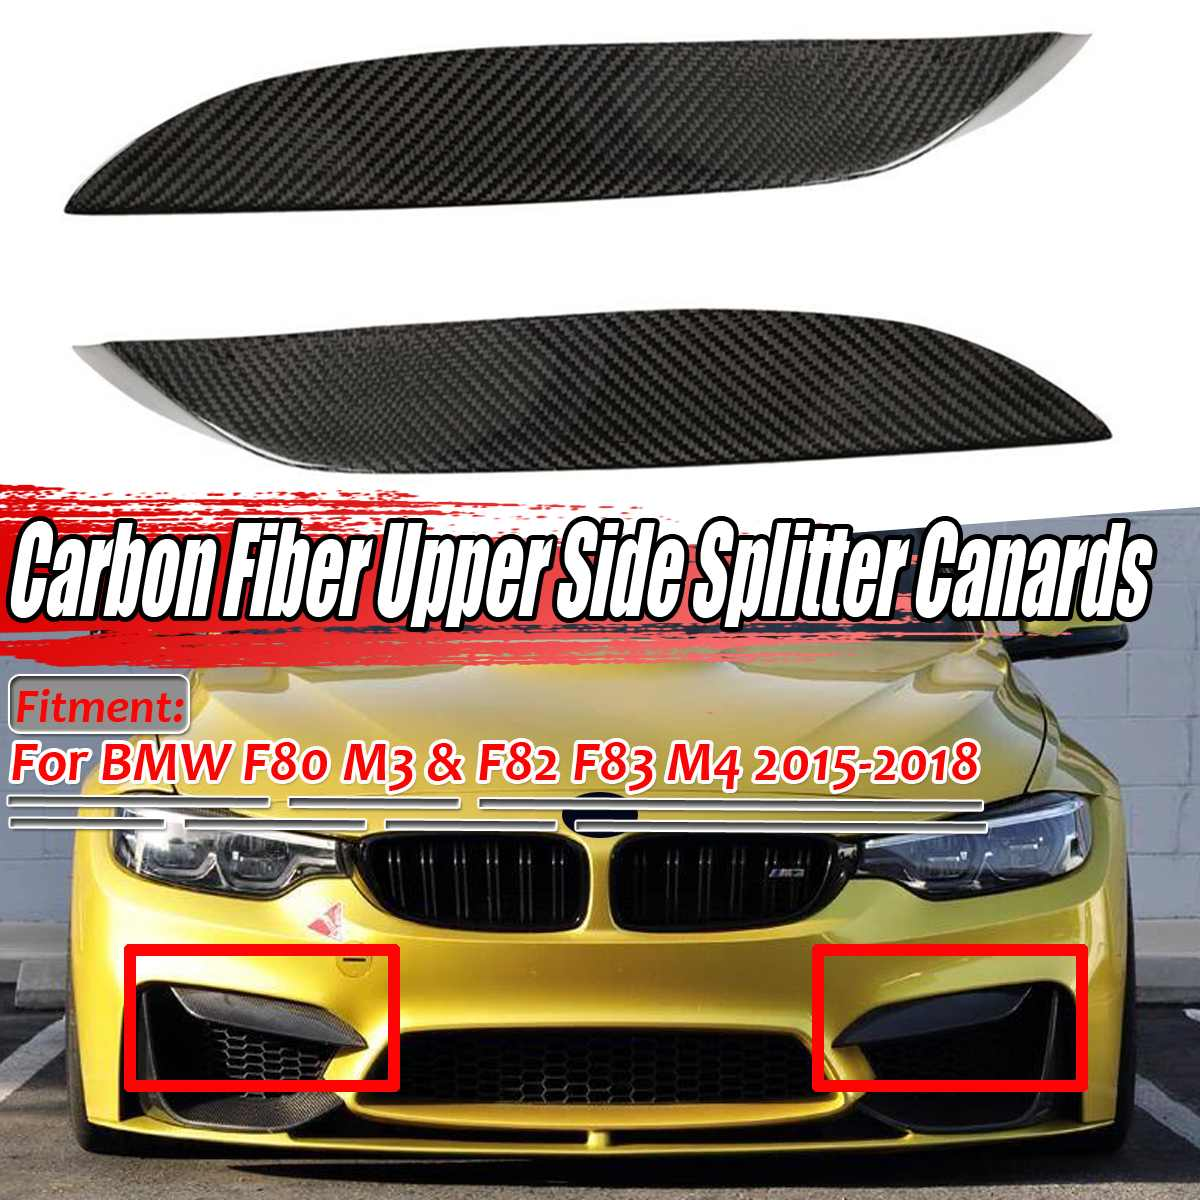 Real Carbon Fiber Rear Bumper Splitter Trim Fit For BMW M3 F80 M4 F82 Tape 14up